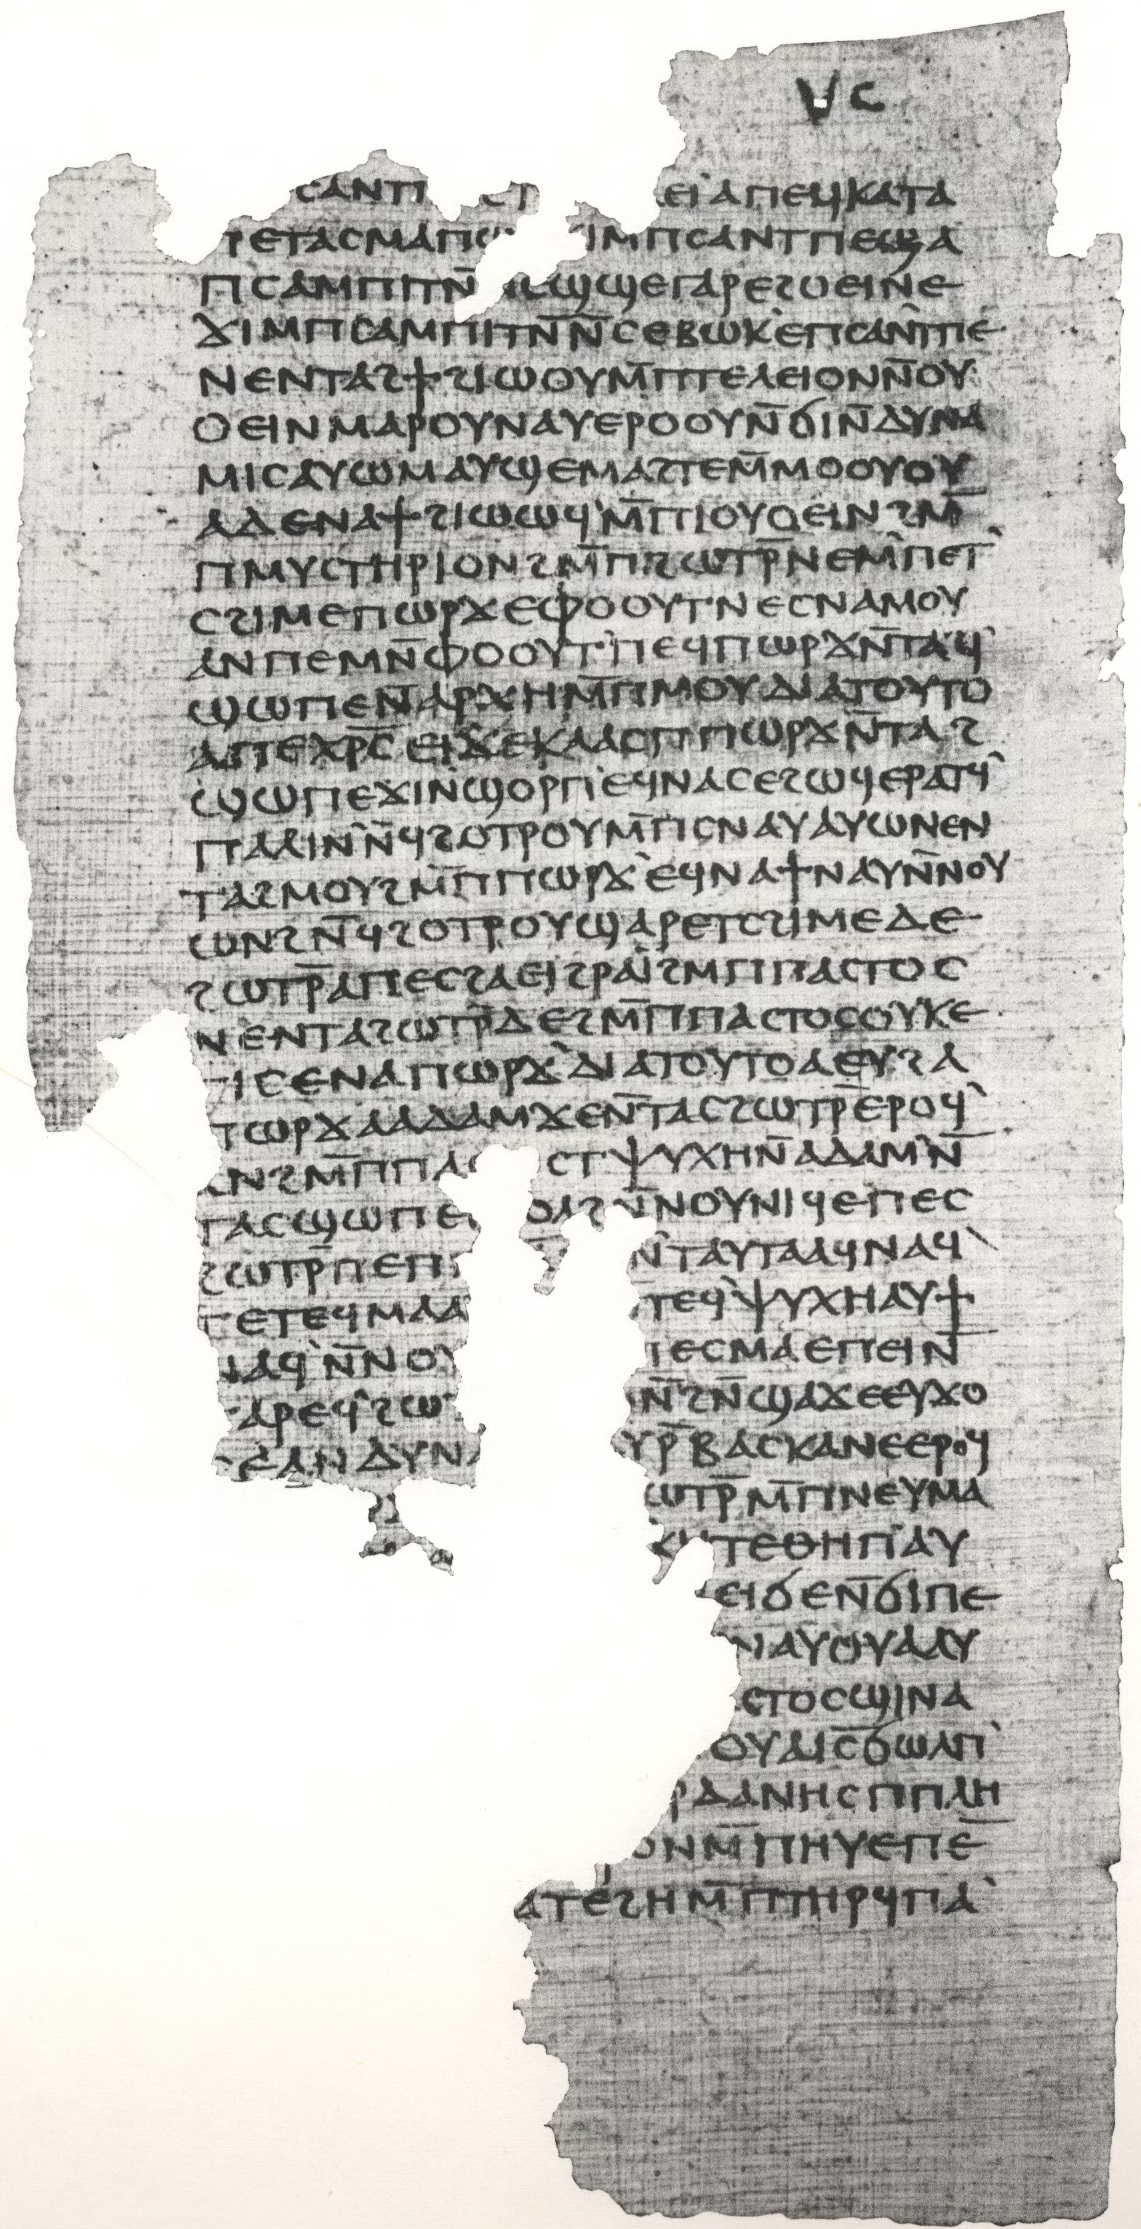 Gospel_of_Philip_facsimile_Page_70.jpg